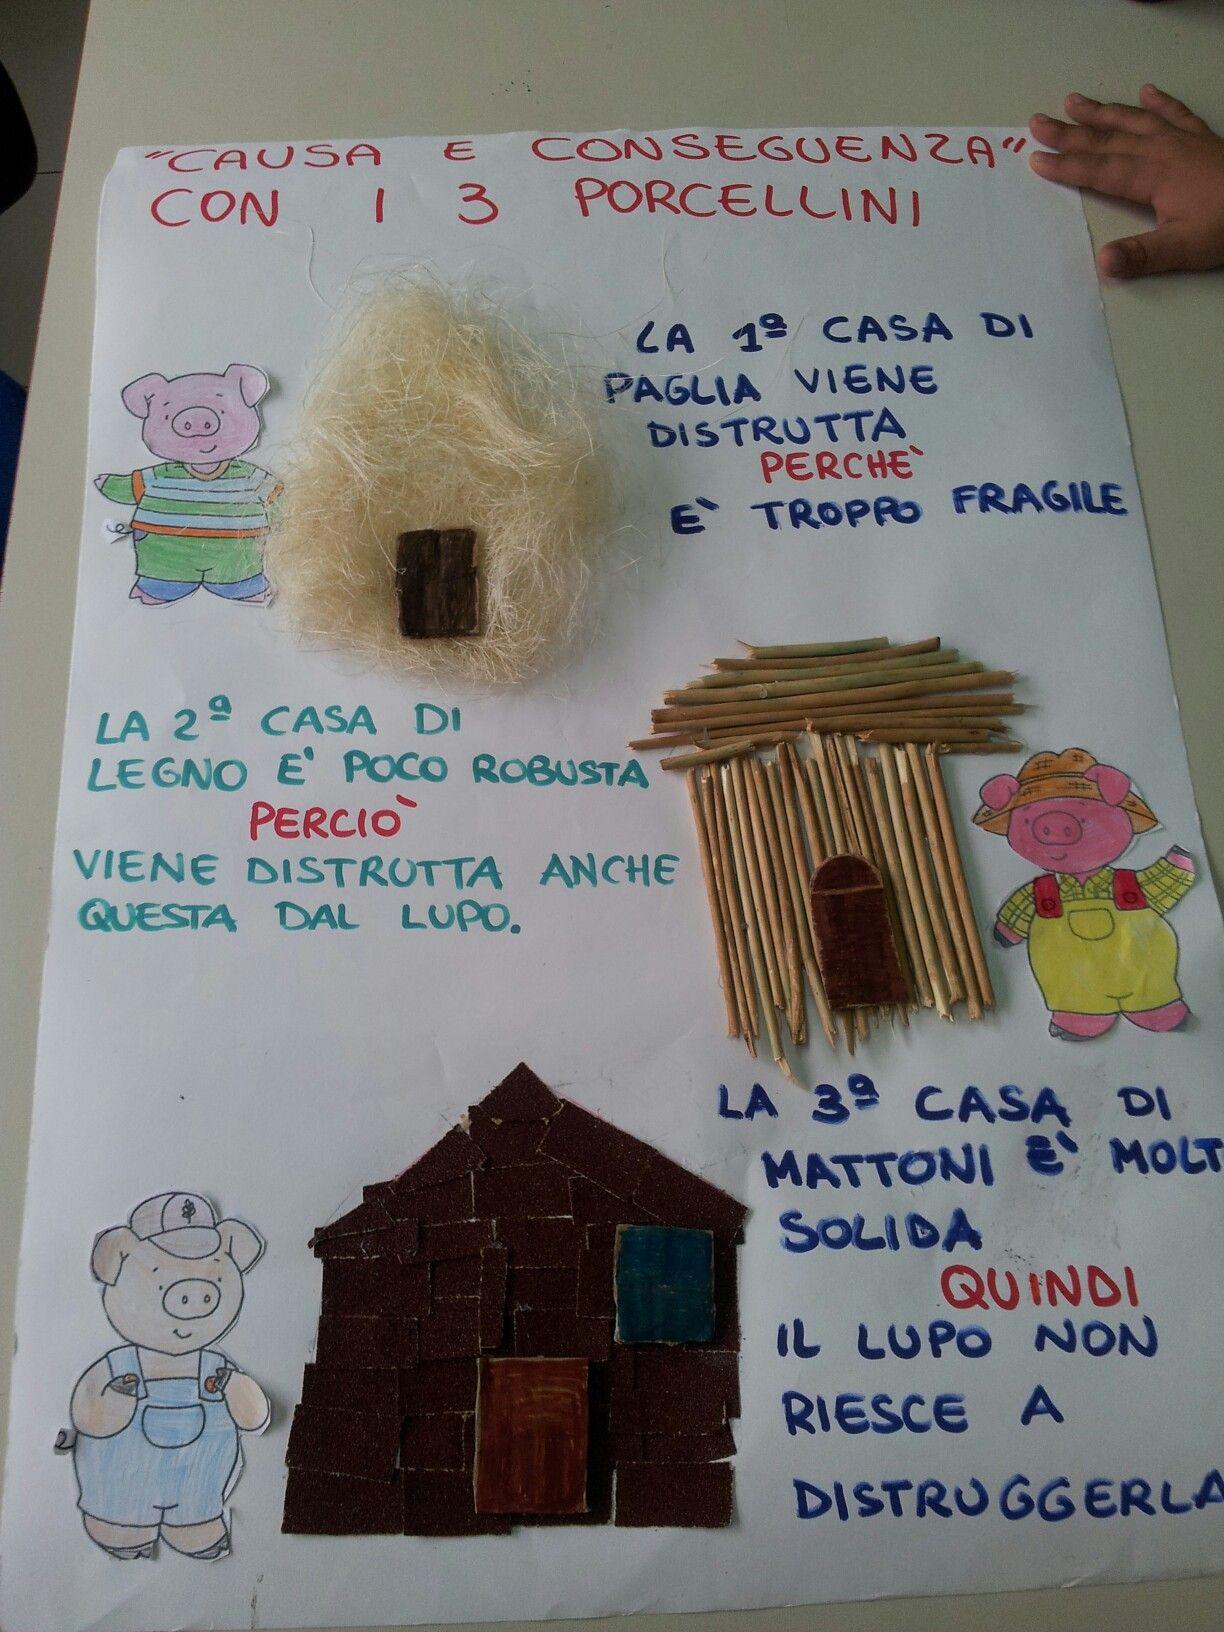 I Tre Porcellini Causa E Conseguenza Storyhour Lady Three Little